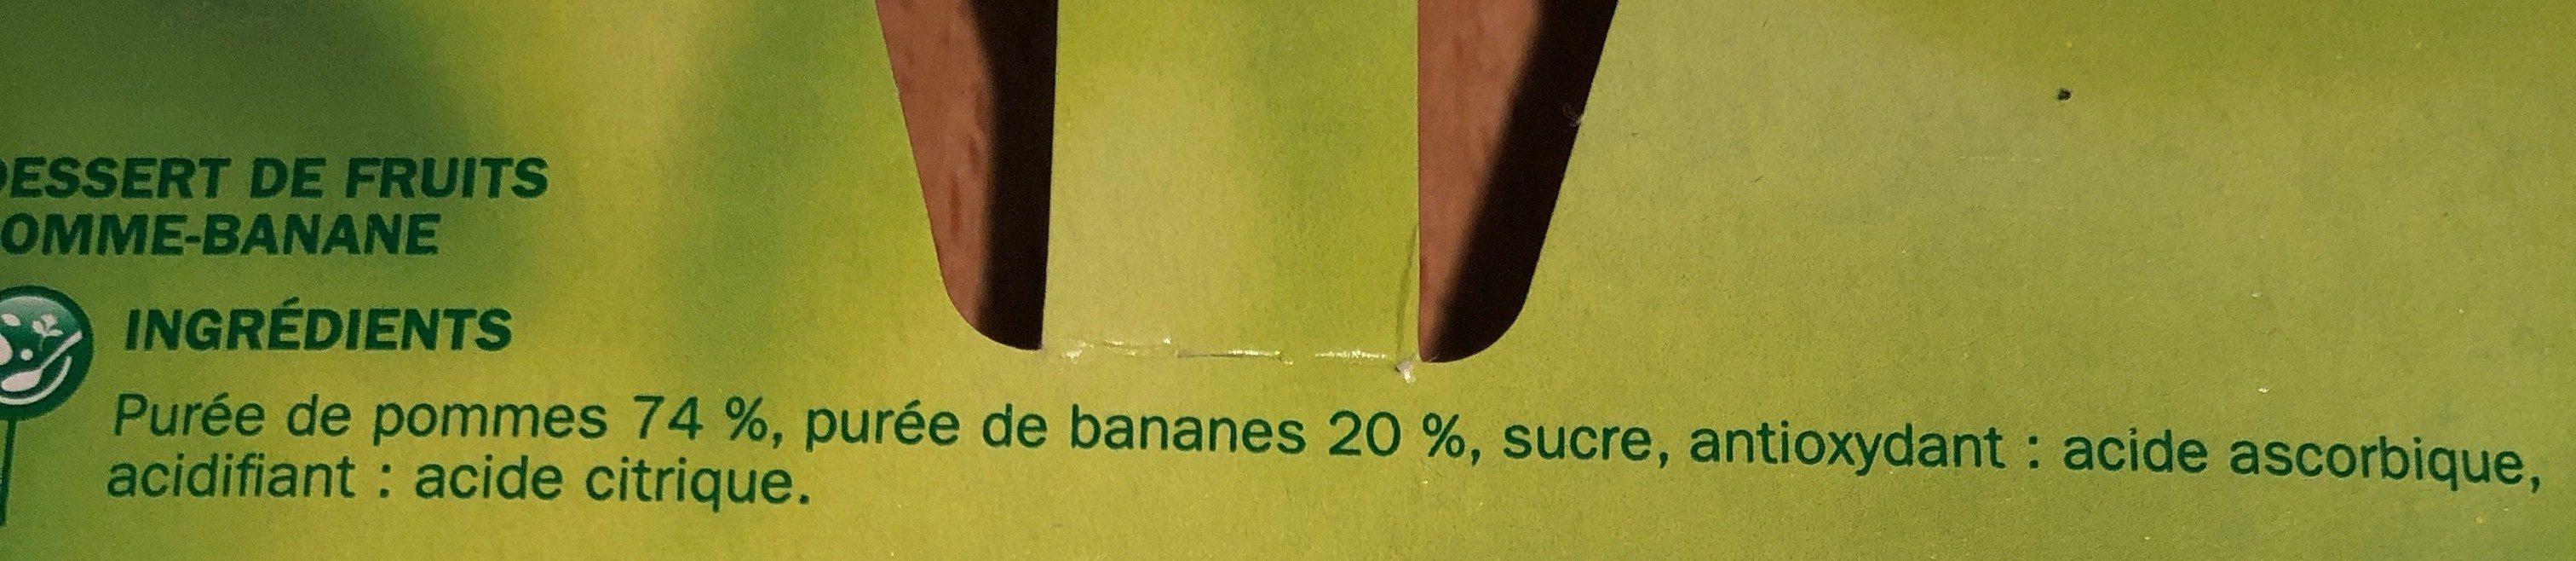 Dessert de fruits pomme banane x4 - Ingredients